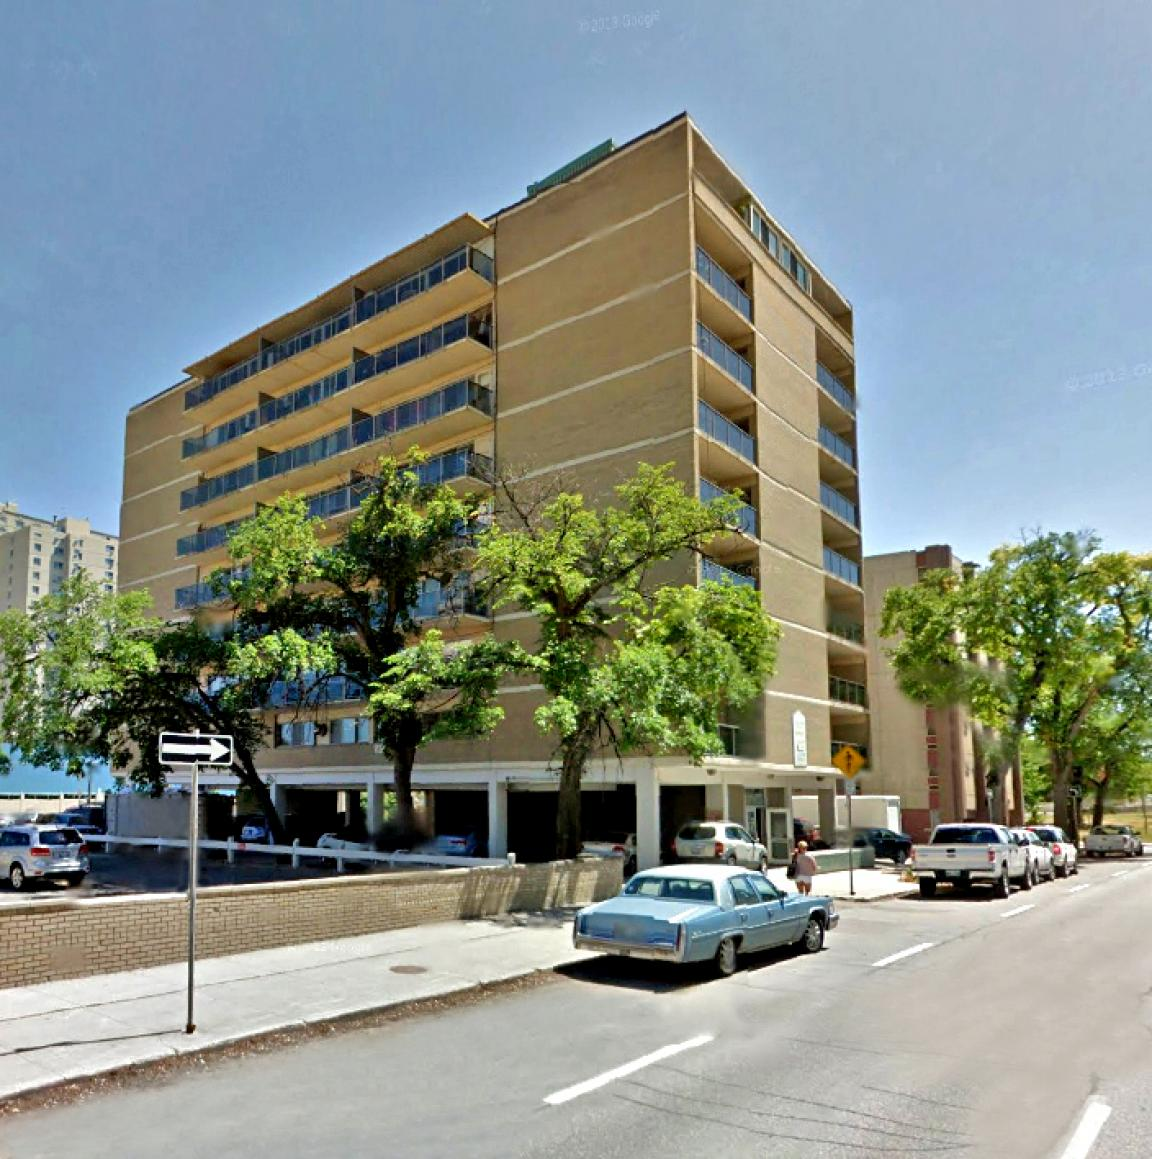 San Moritz Apartments: ApartmentLove